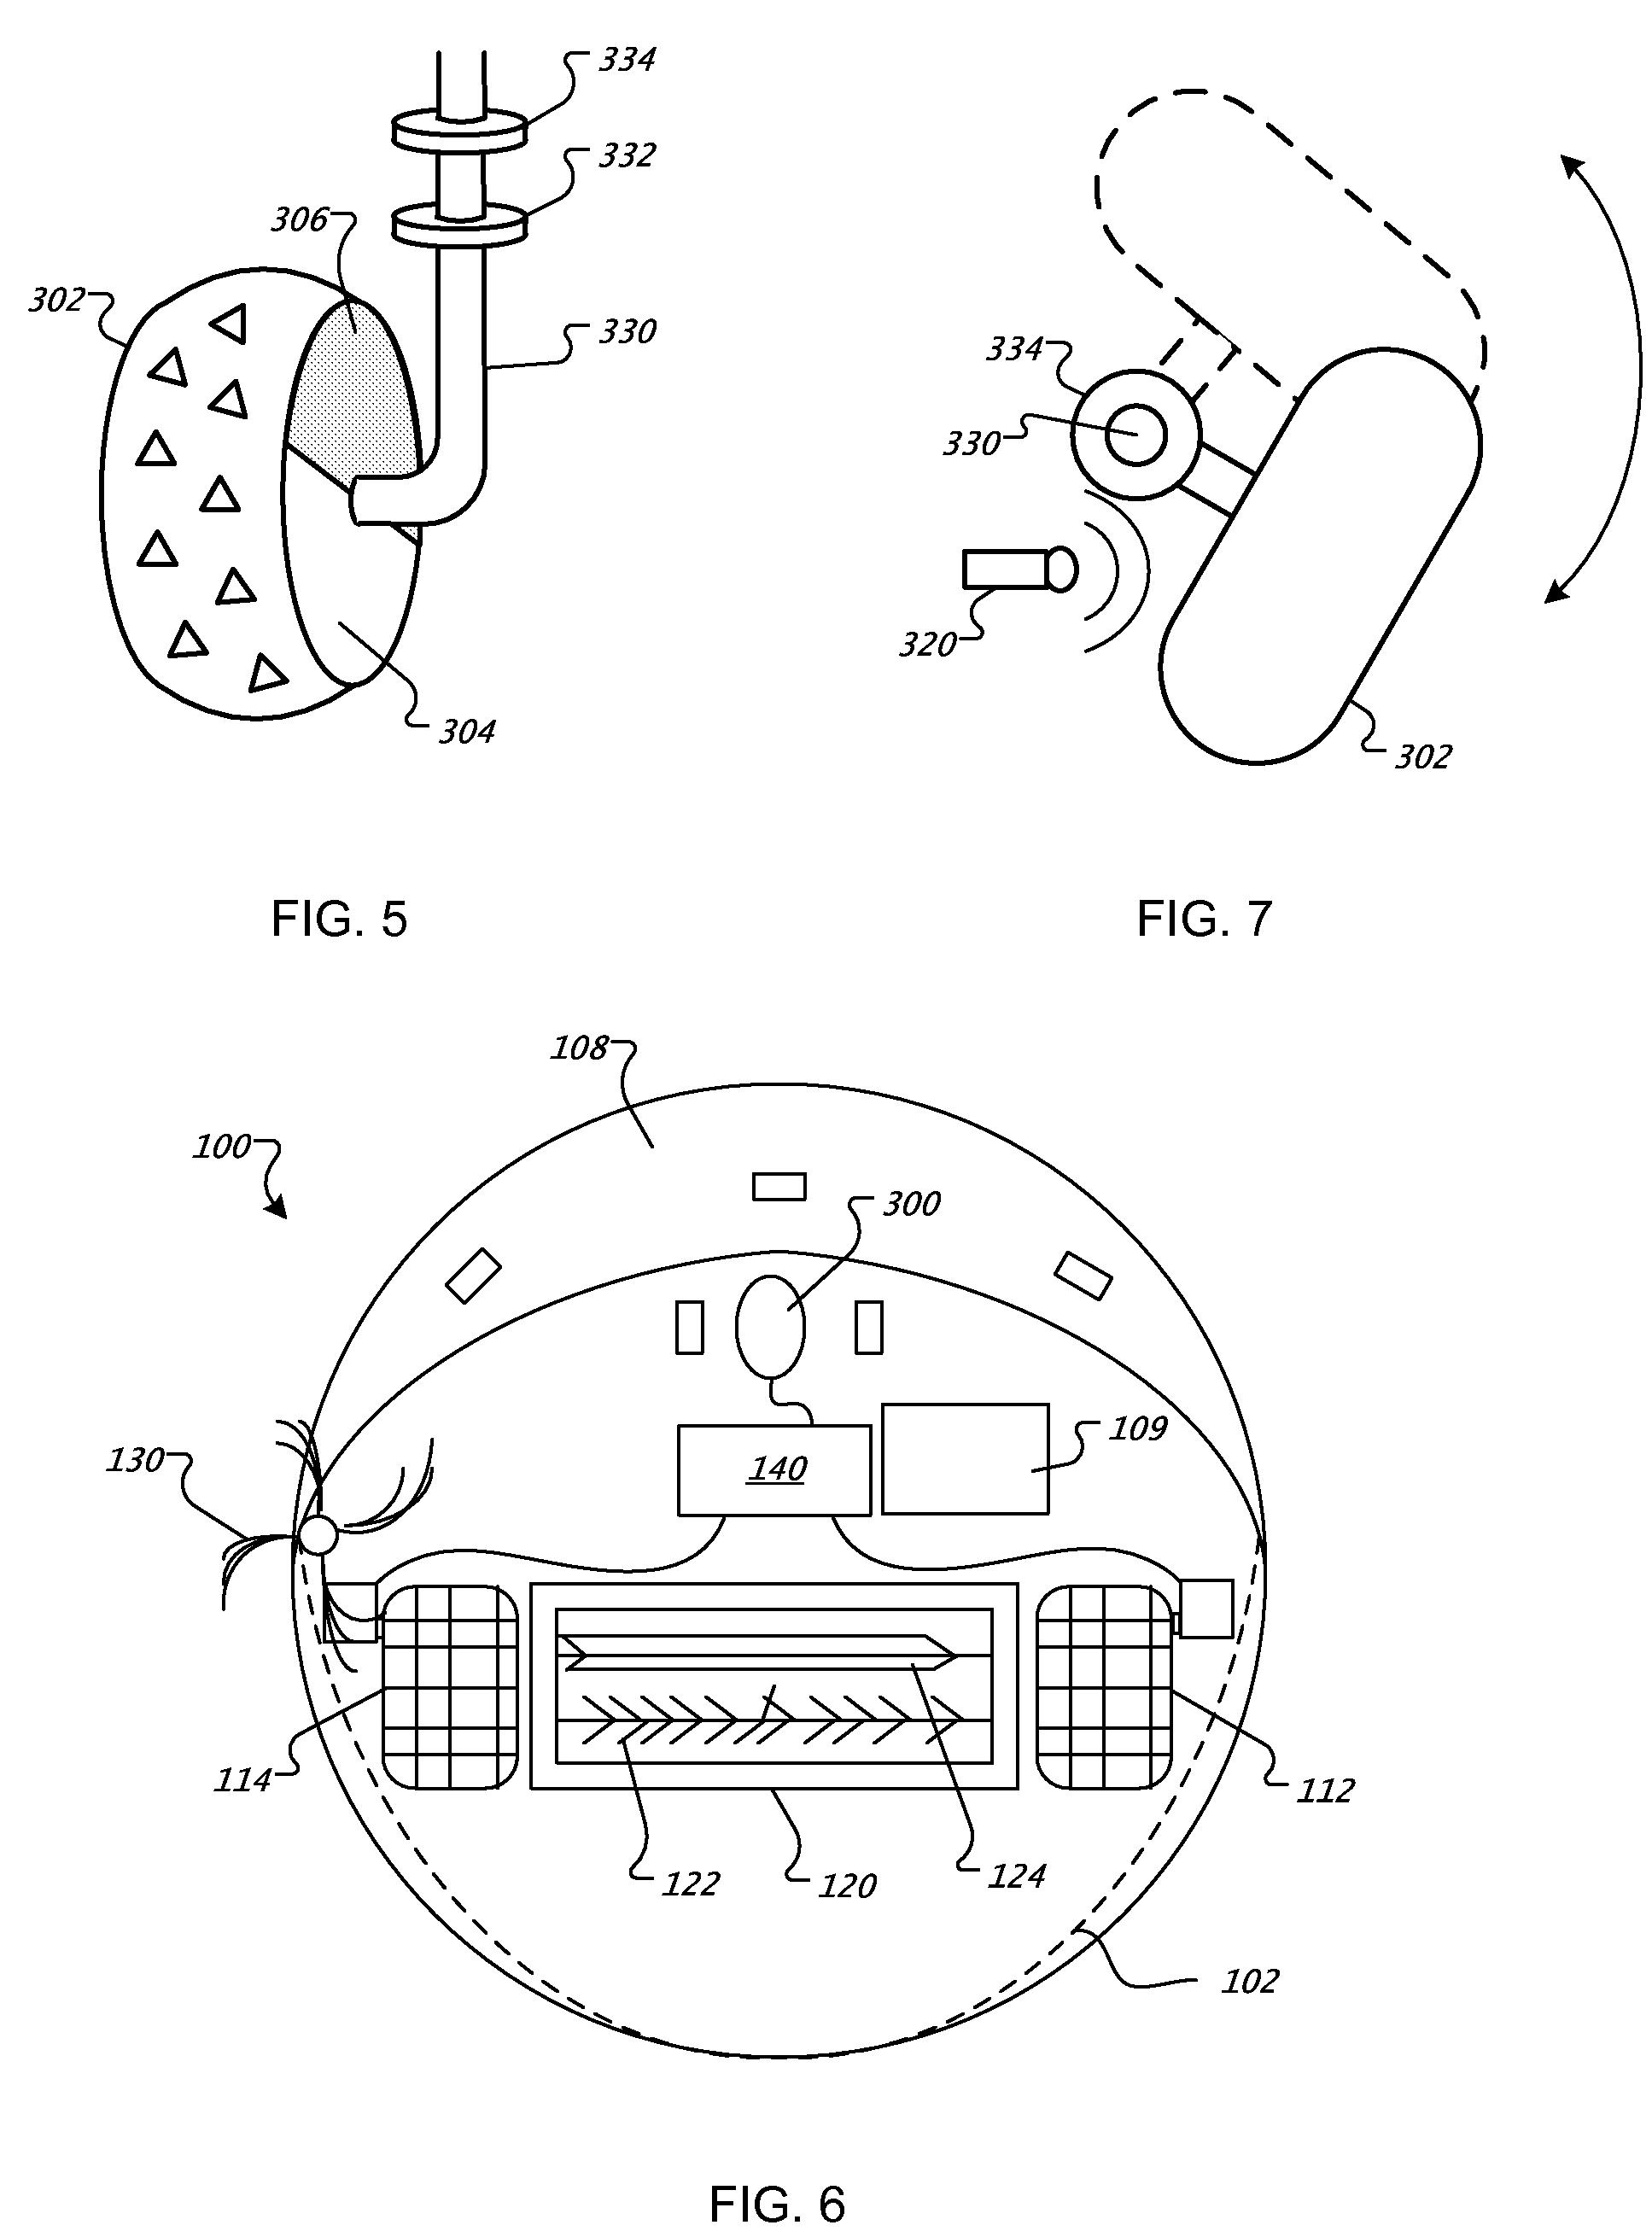 patent us 8 417 383 b2 4.3 Firing Order Diagram patent